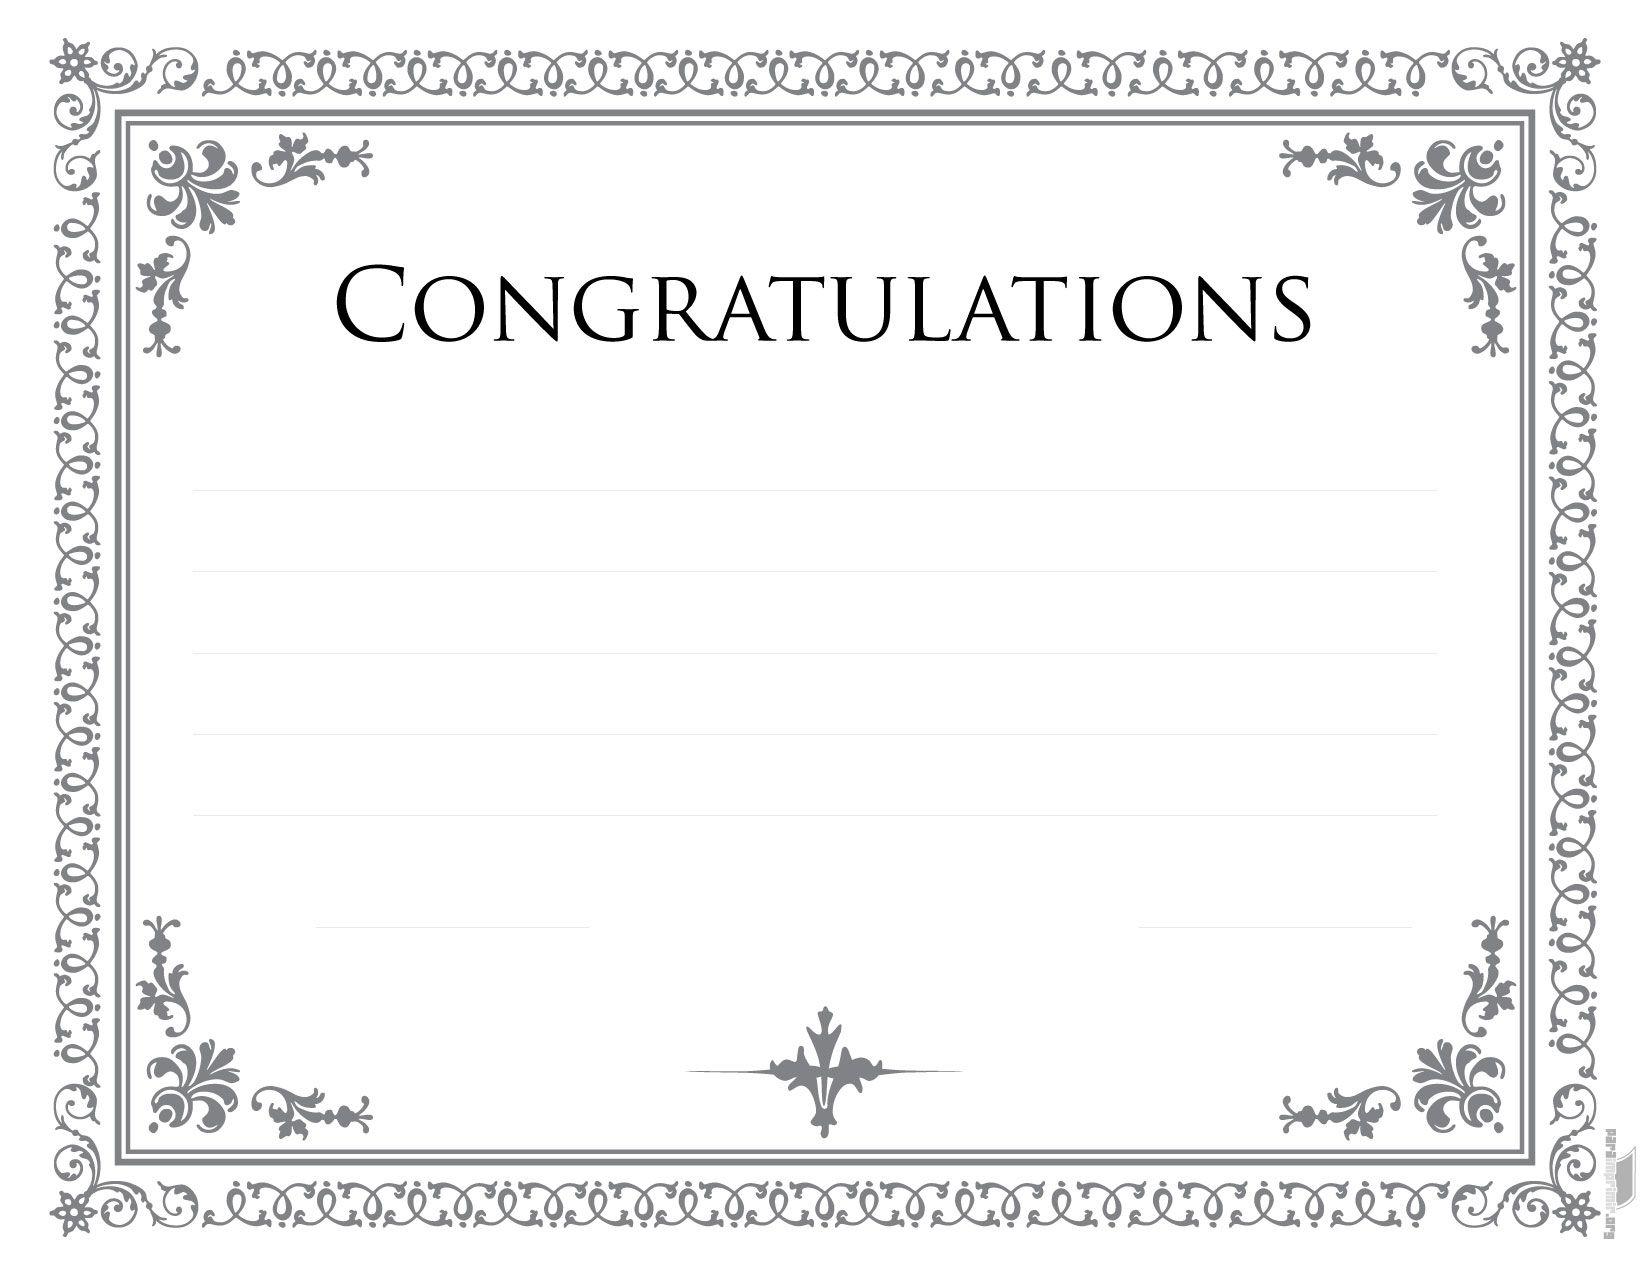 Diploma de congratulations para imprimir | otro borde | Pinterest